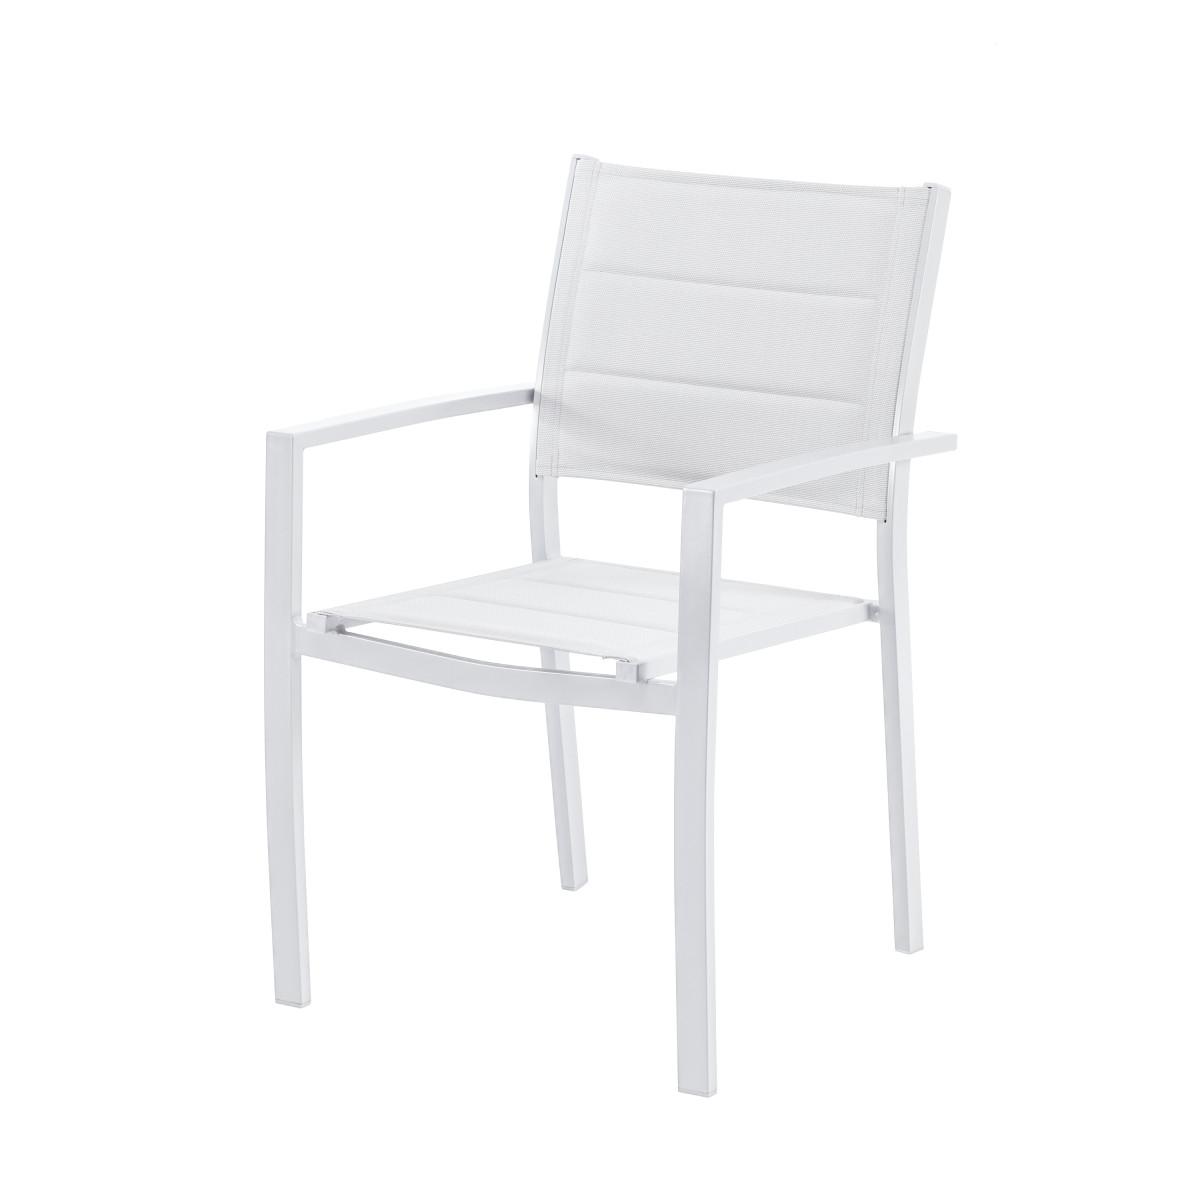 Кресло Naterial Orion Beta цвет светло-серый